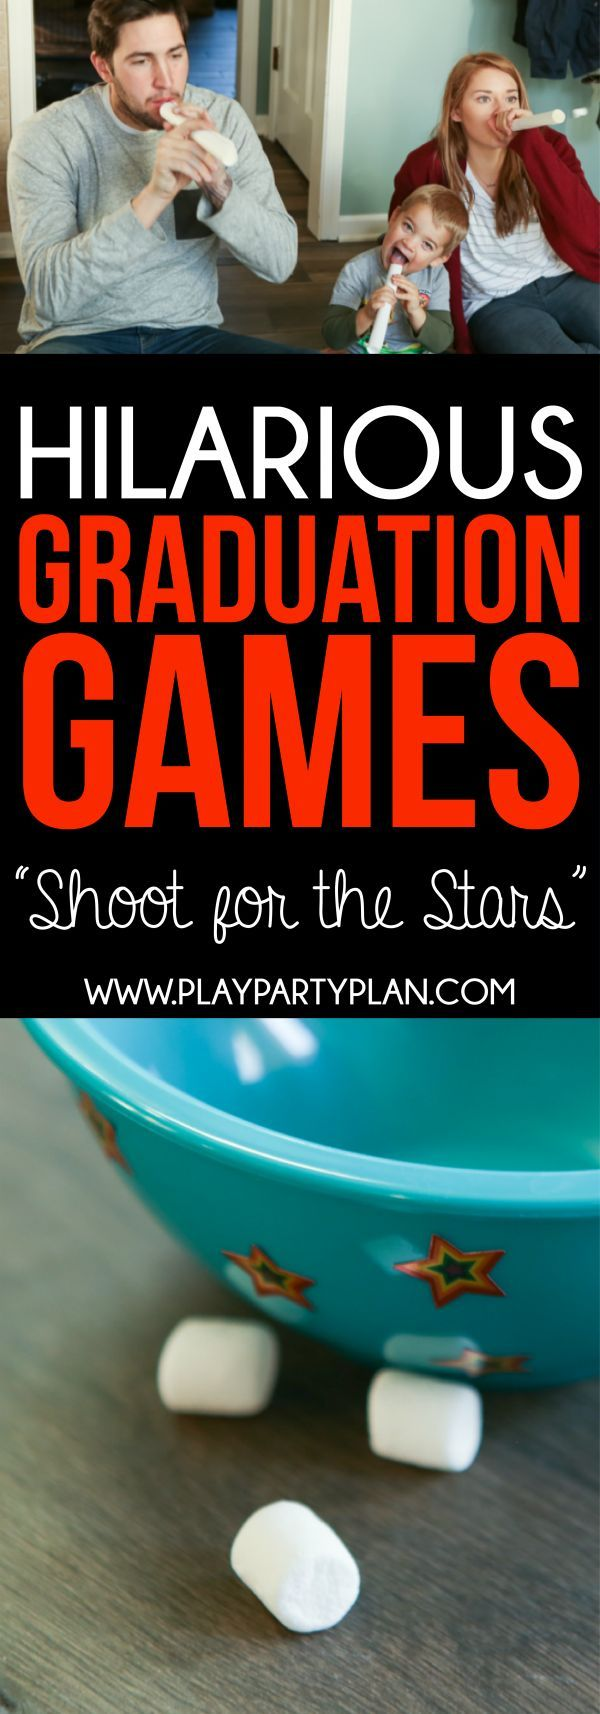 Medium Crop Of Graduation Party Games